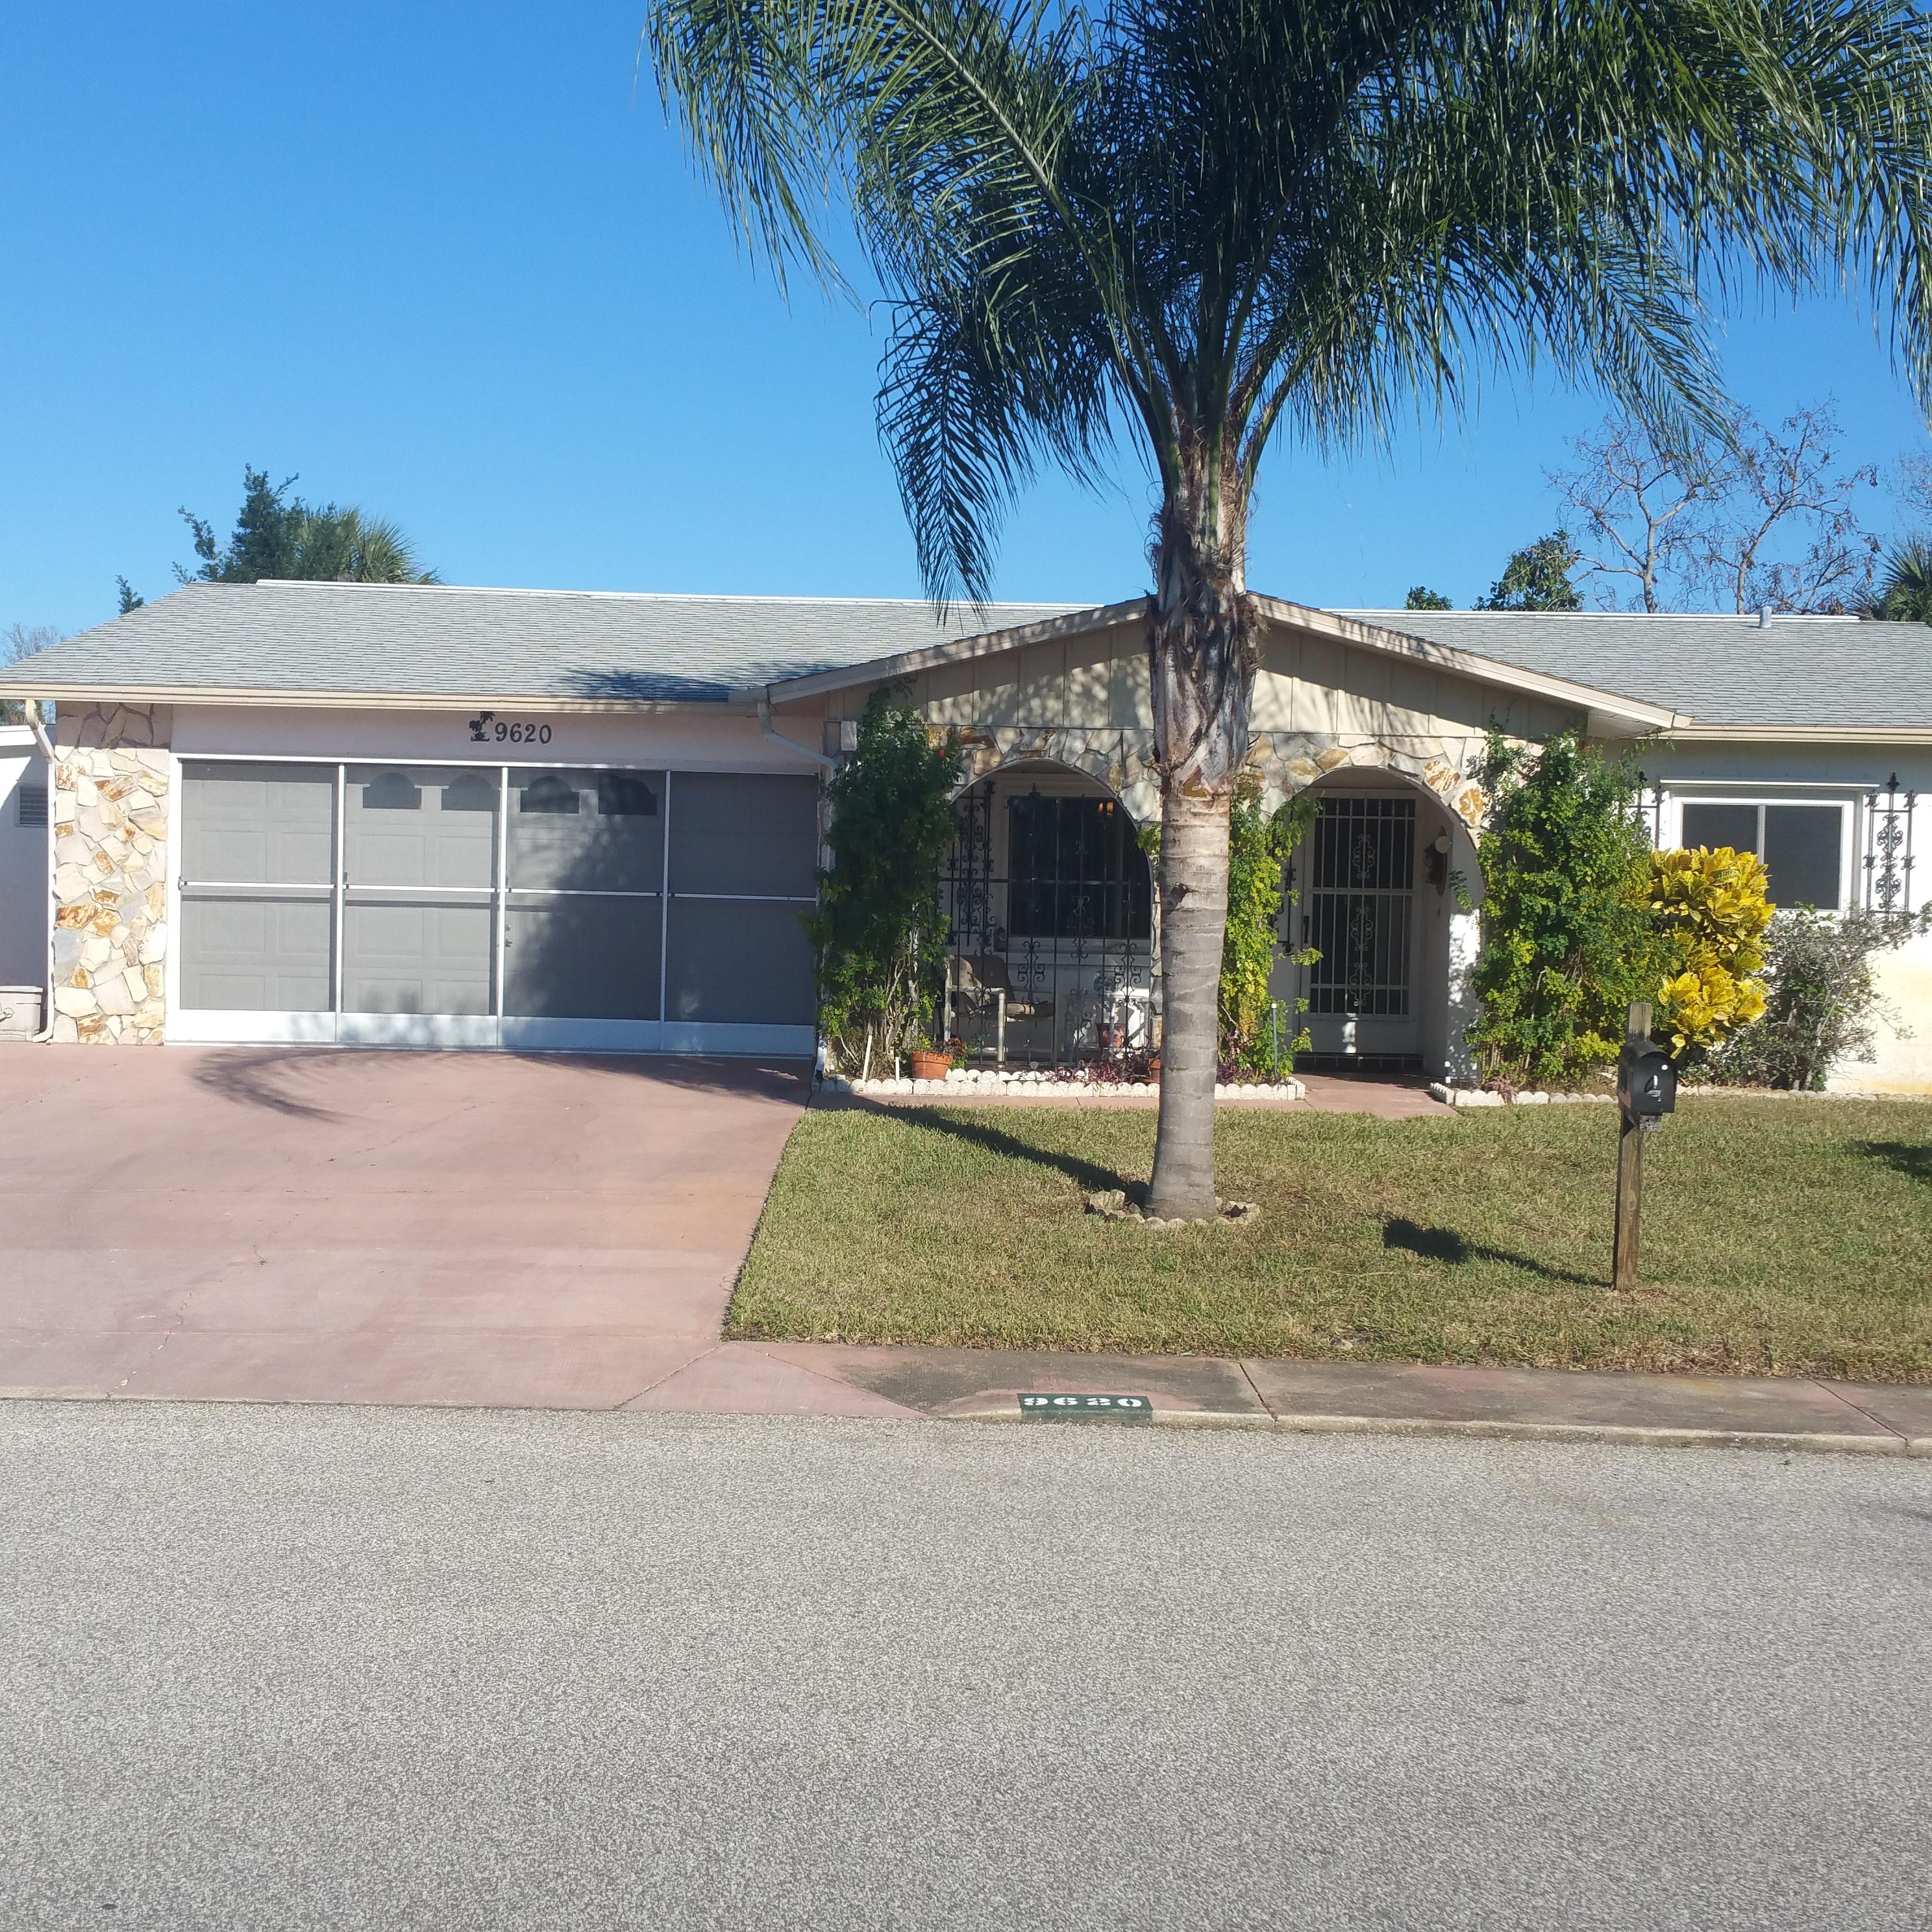 9620 Lake Christina Ln., Port Richey, Florida 34668